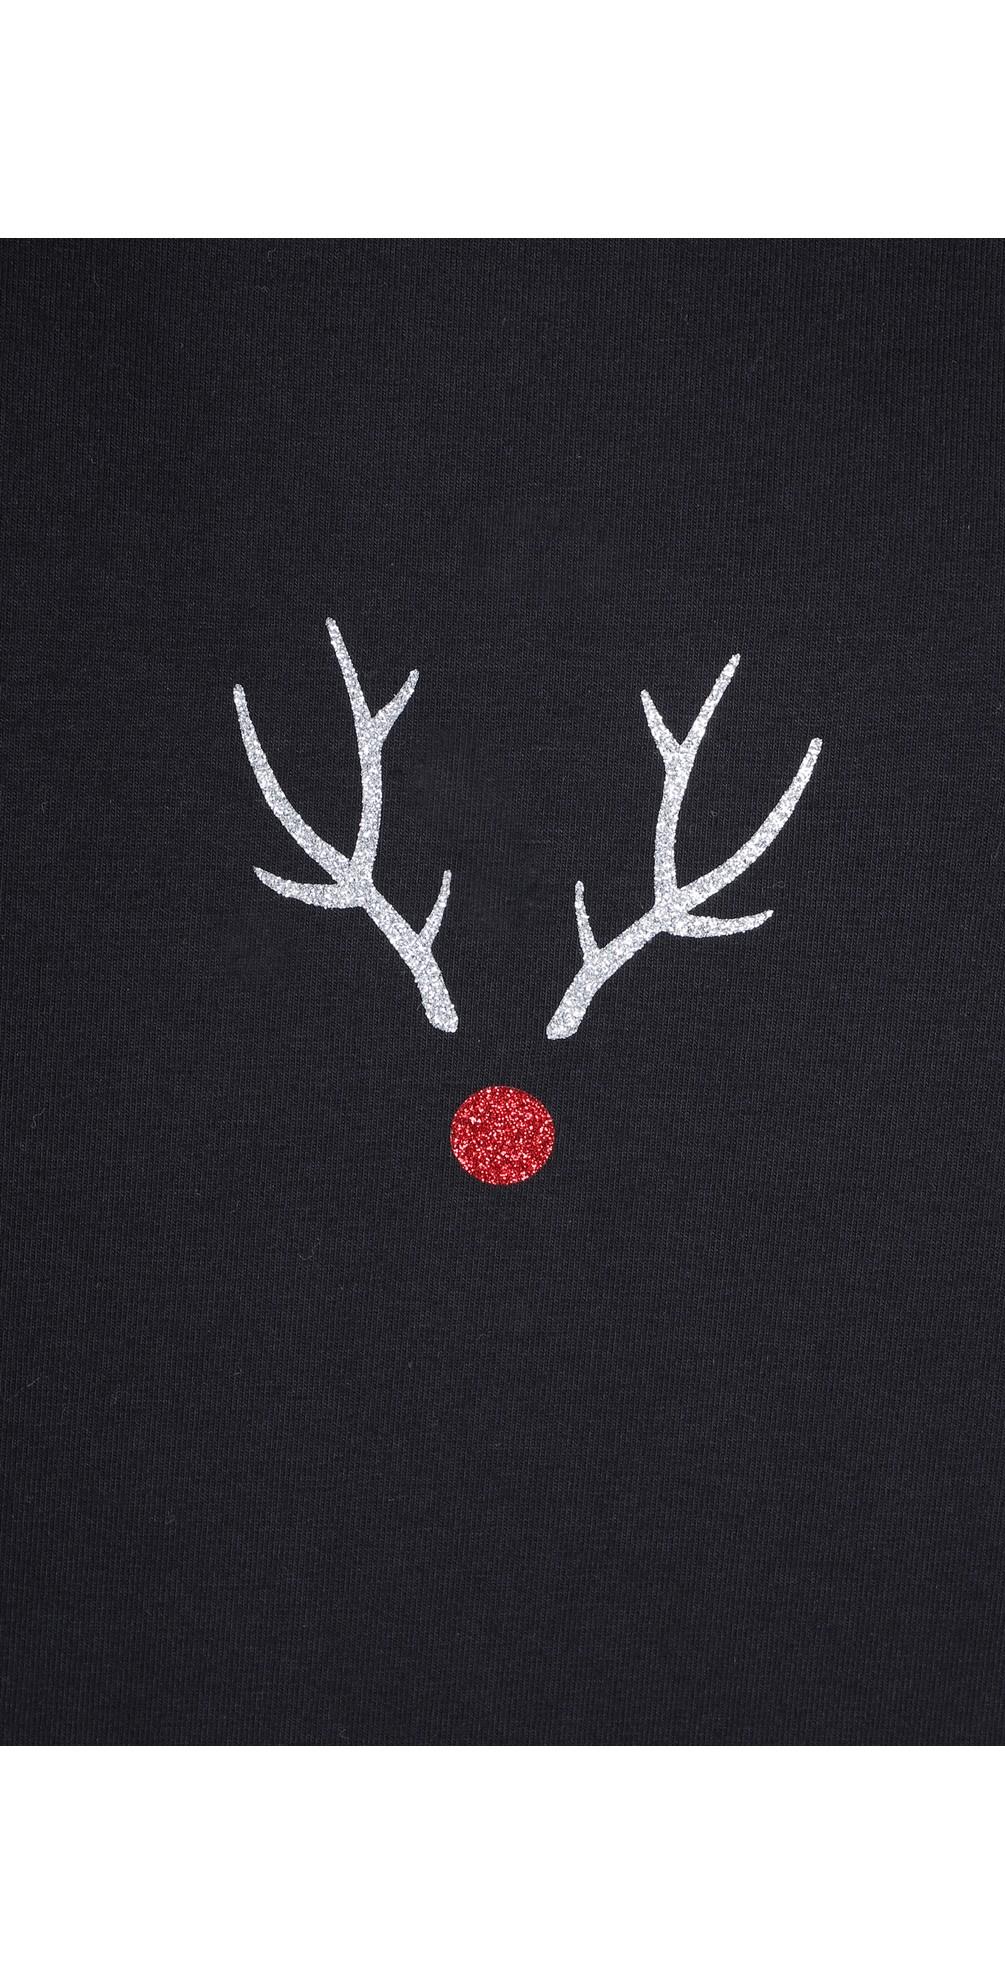 Robyn Reindeer Top main image